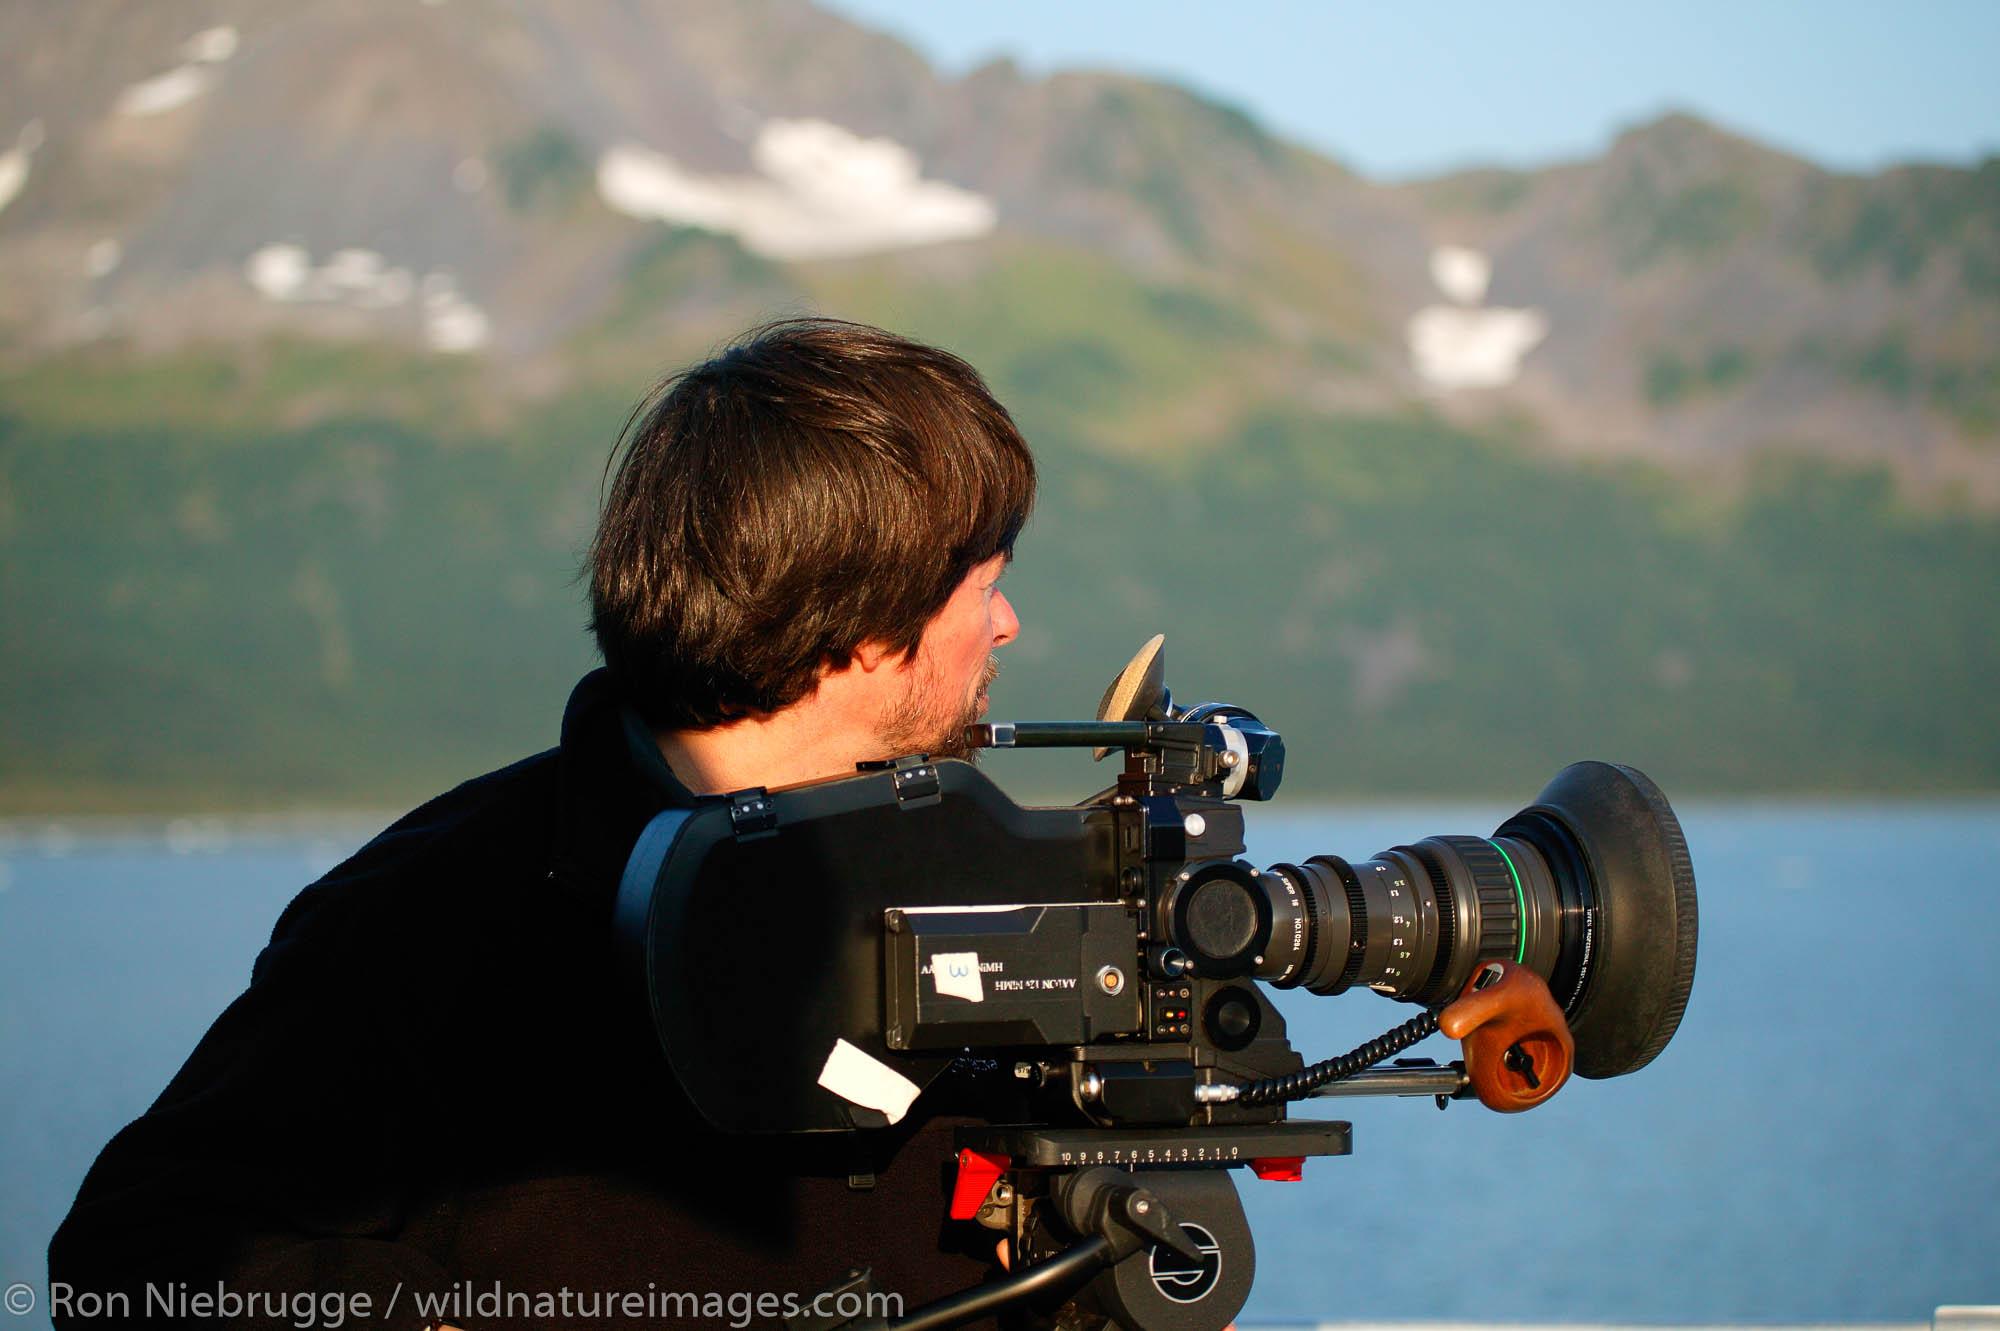 Ken Burns in Aialik Bay, Kenai Fjords National Park, Alaska.